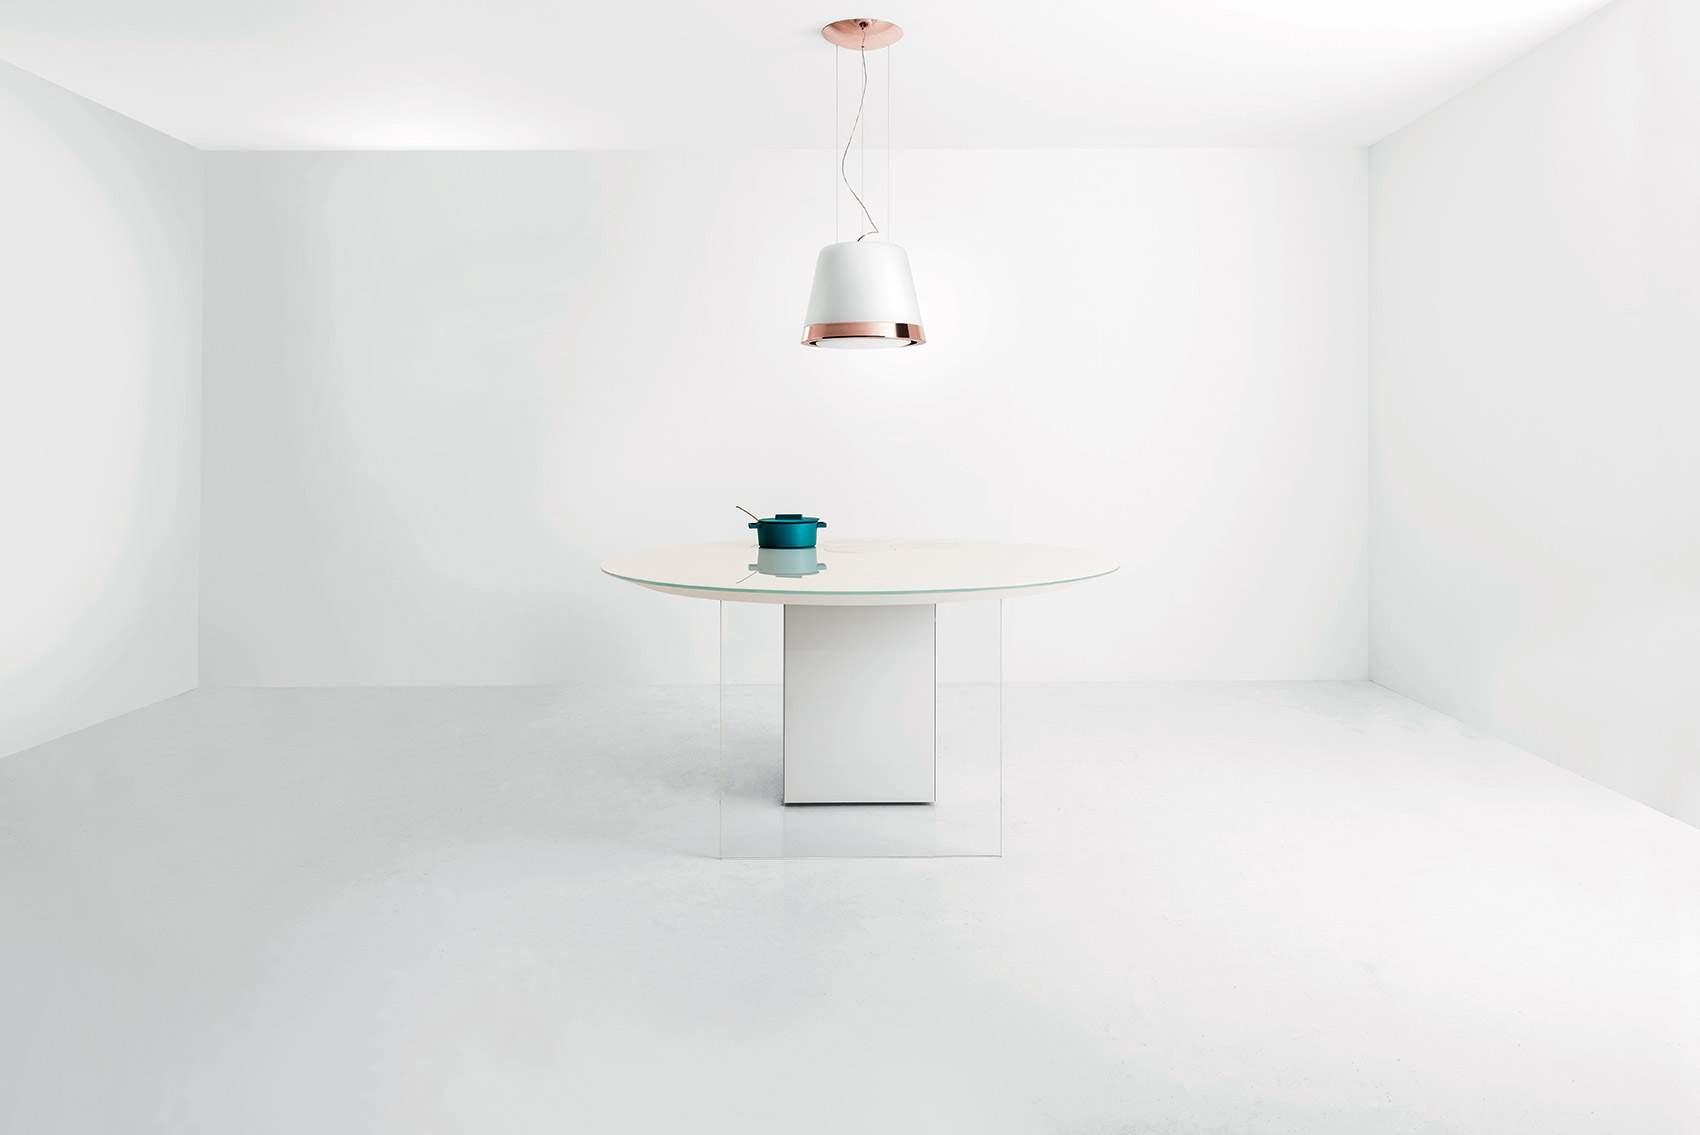 Cuisine AIR – Daniele LAGO